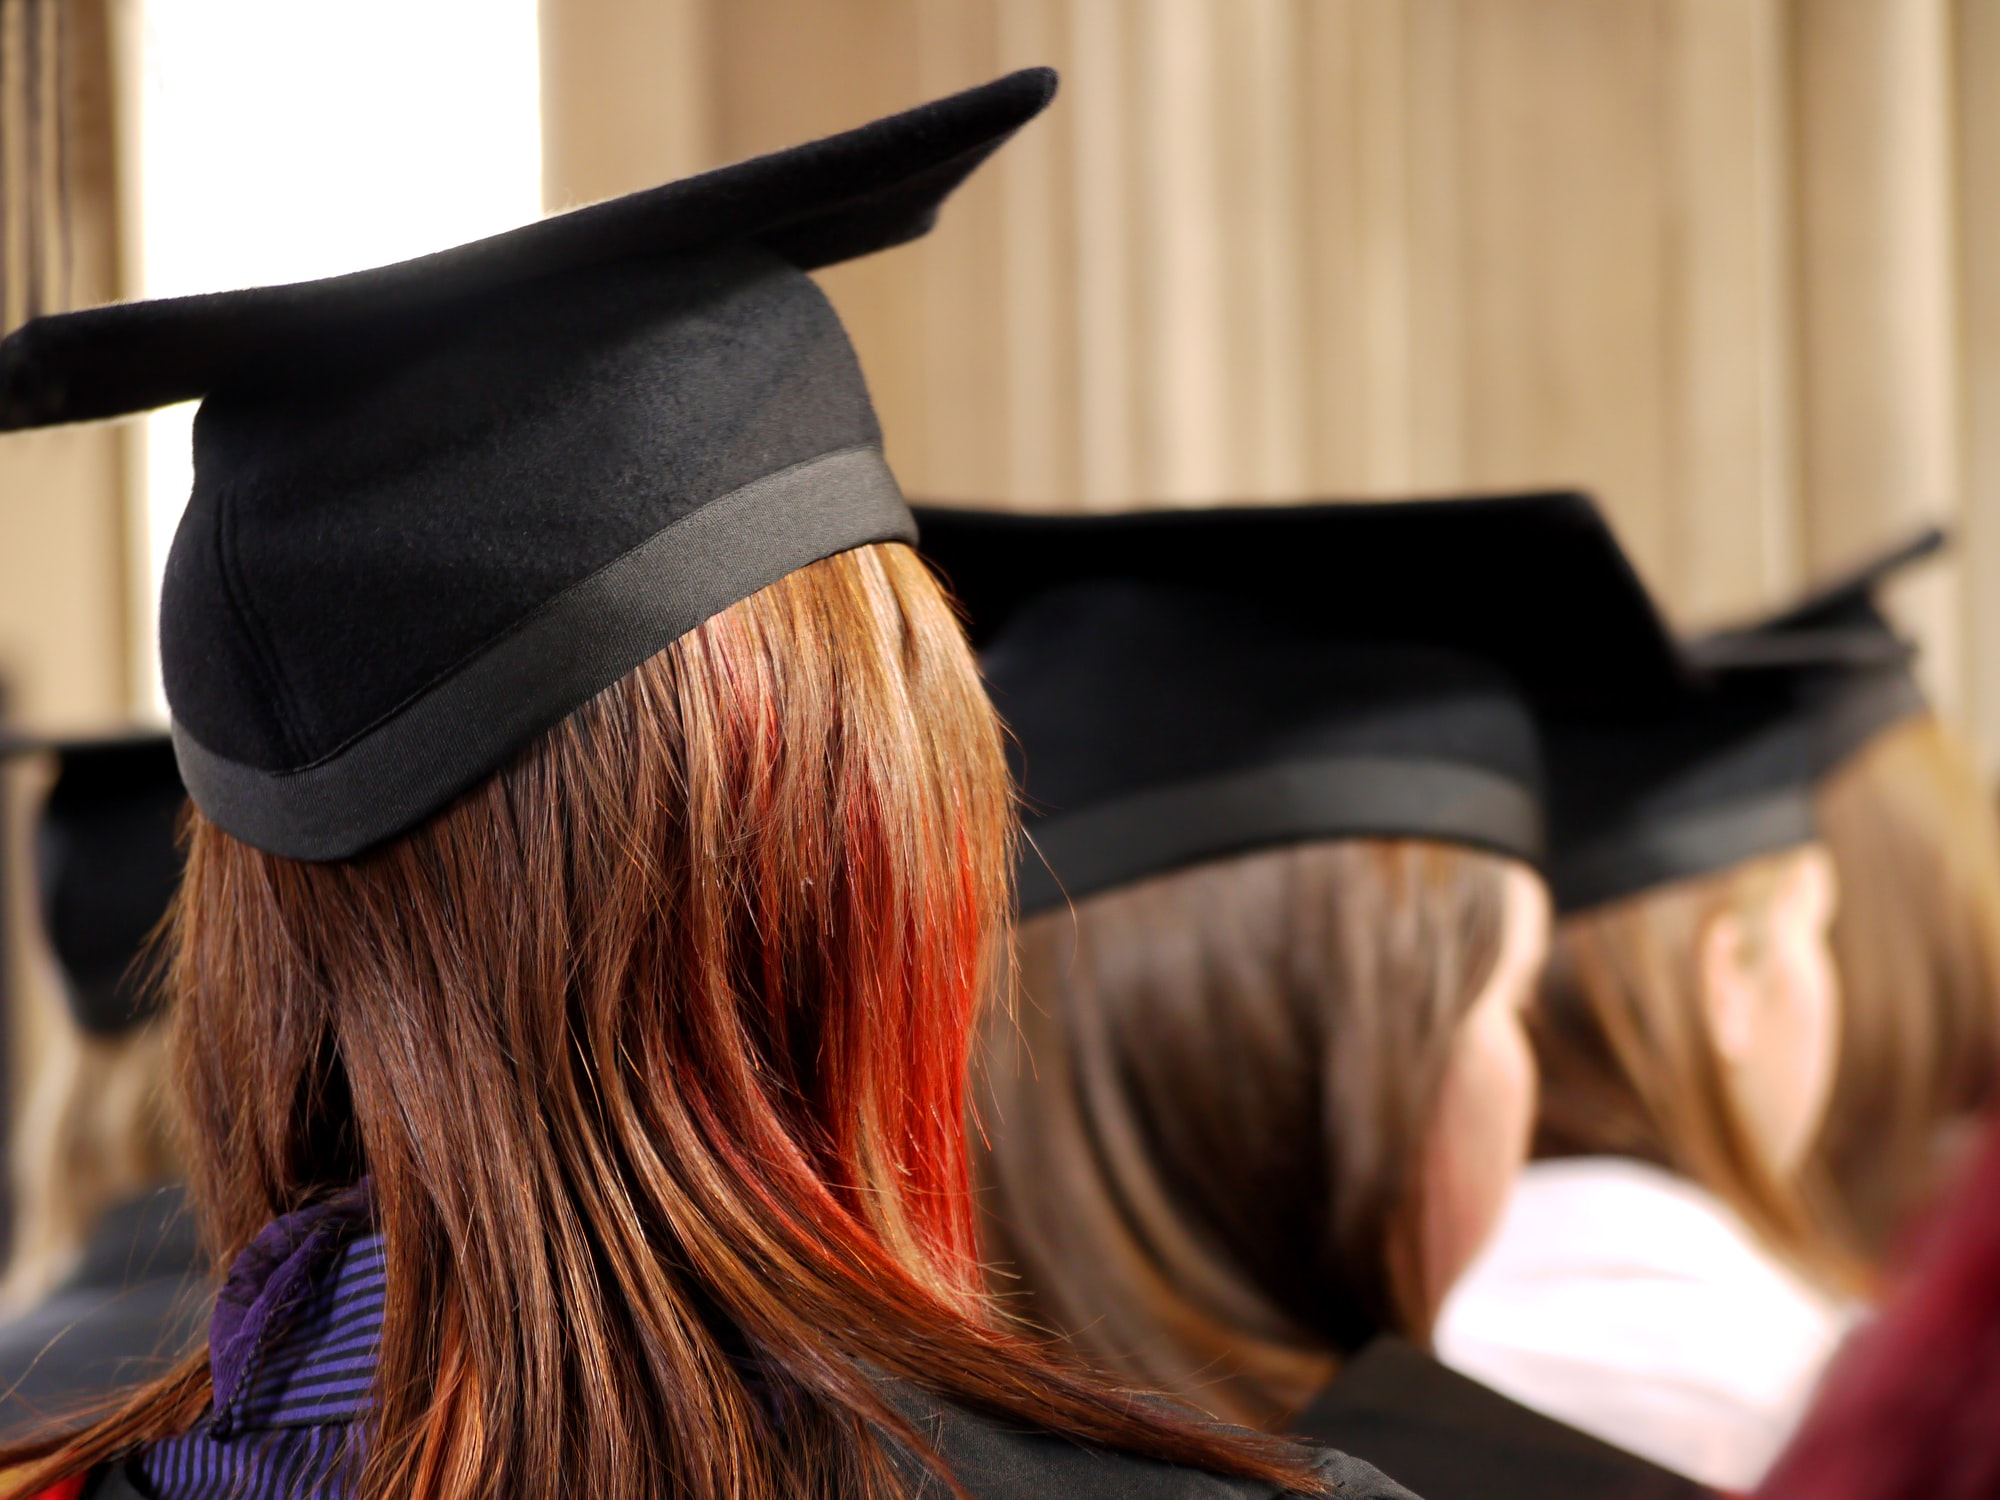 Universities Win Lawsuit Against Obama-era Policy Mandating Free Abortifacients